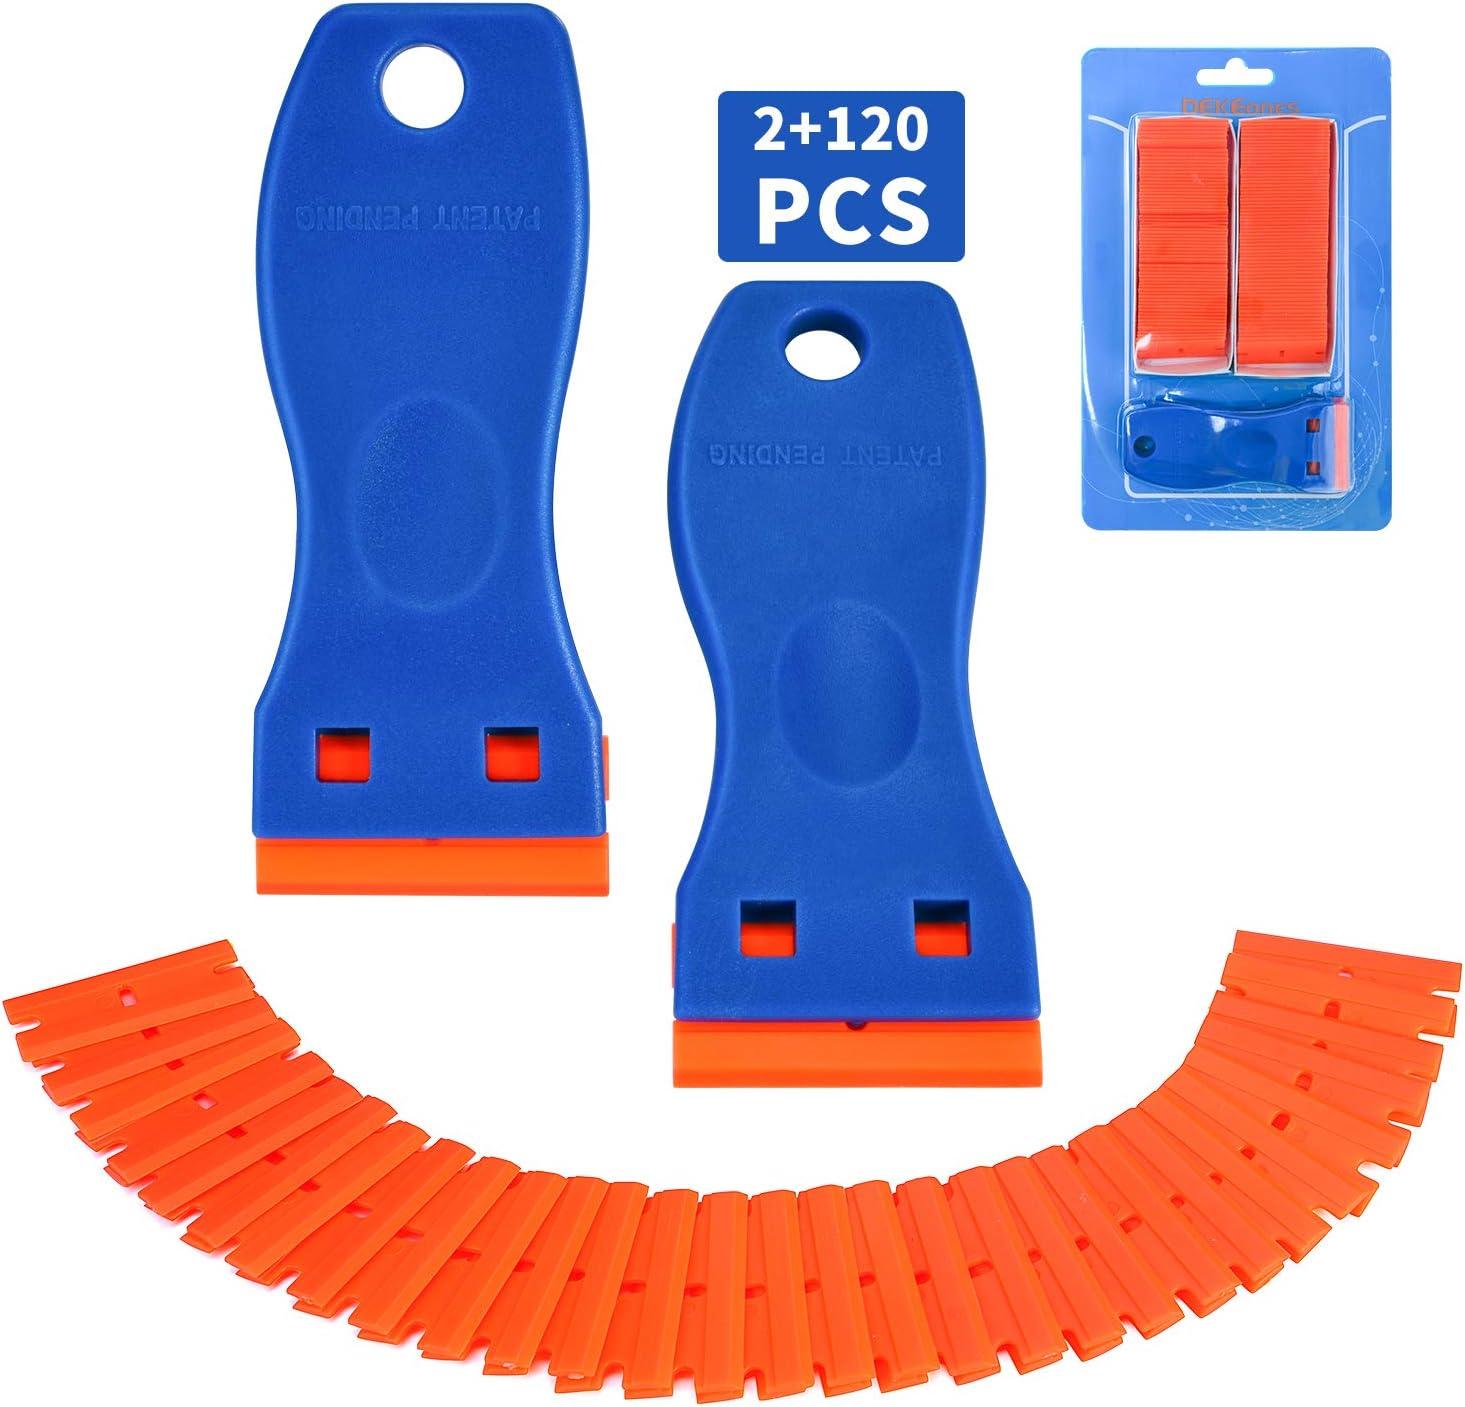 Plastic Razor Blade Scraper, 2 Pack Razor Scraper with 120 Pcs Razor Blades for Removing Glue, Sticker, Decals, Tint from Car Window and Glass